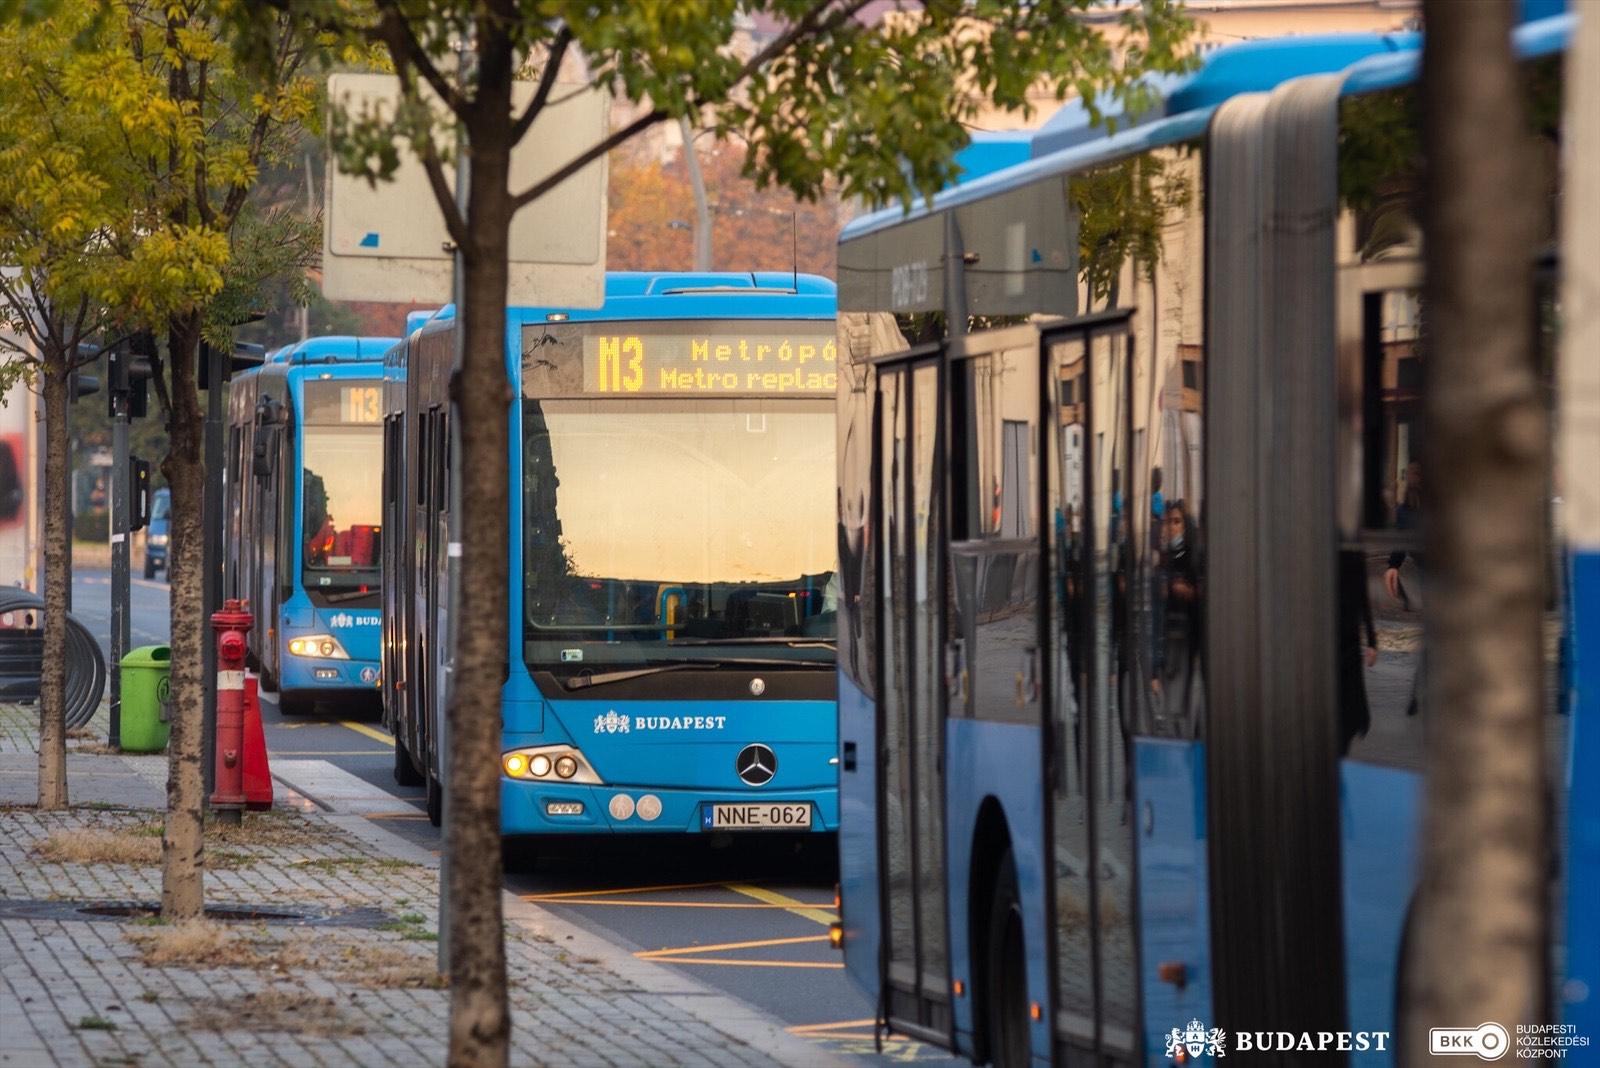 m3 metro bus budapest